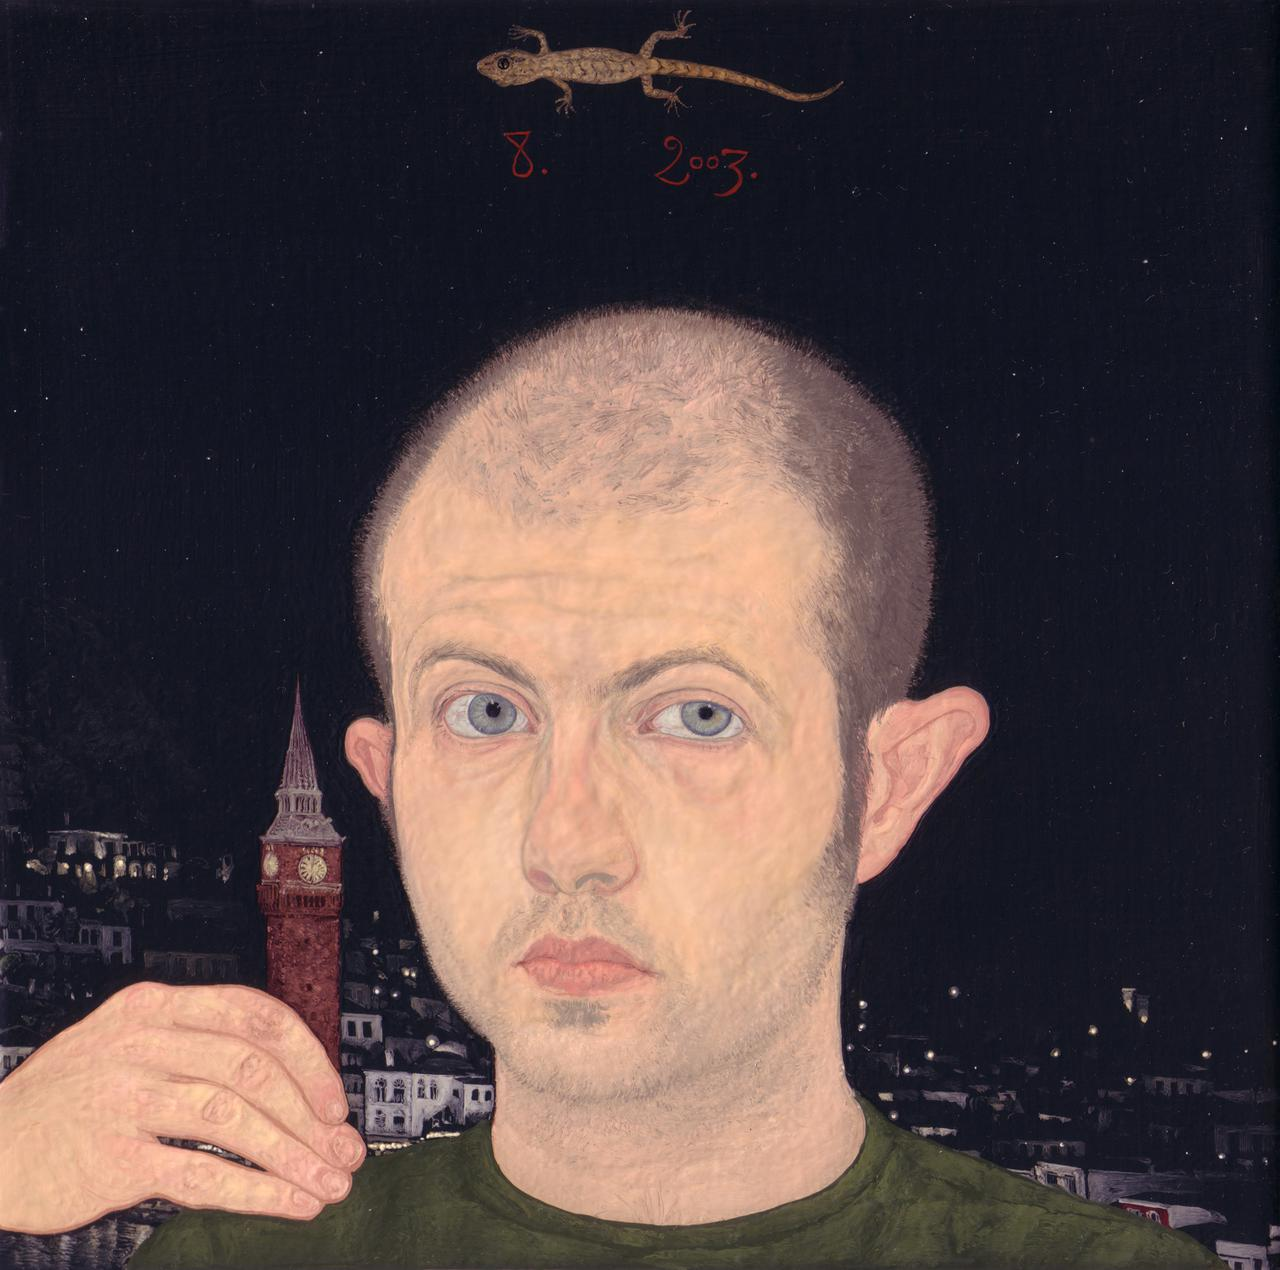 Emmanouil Bitsakis, Self Portrait, oil on canvas, 20 x 20cm, 2003